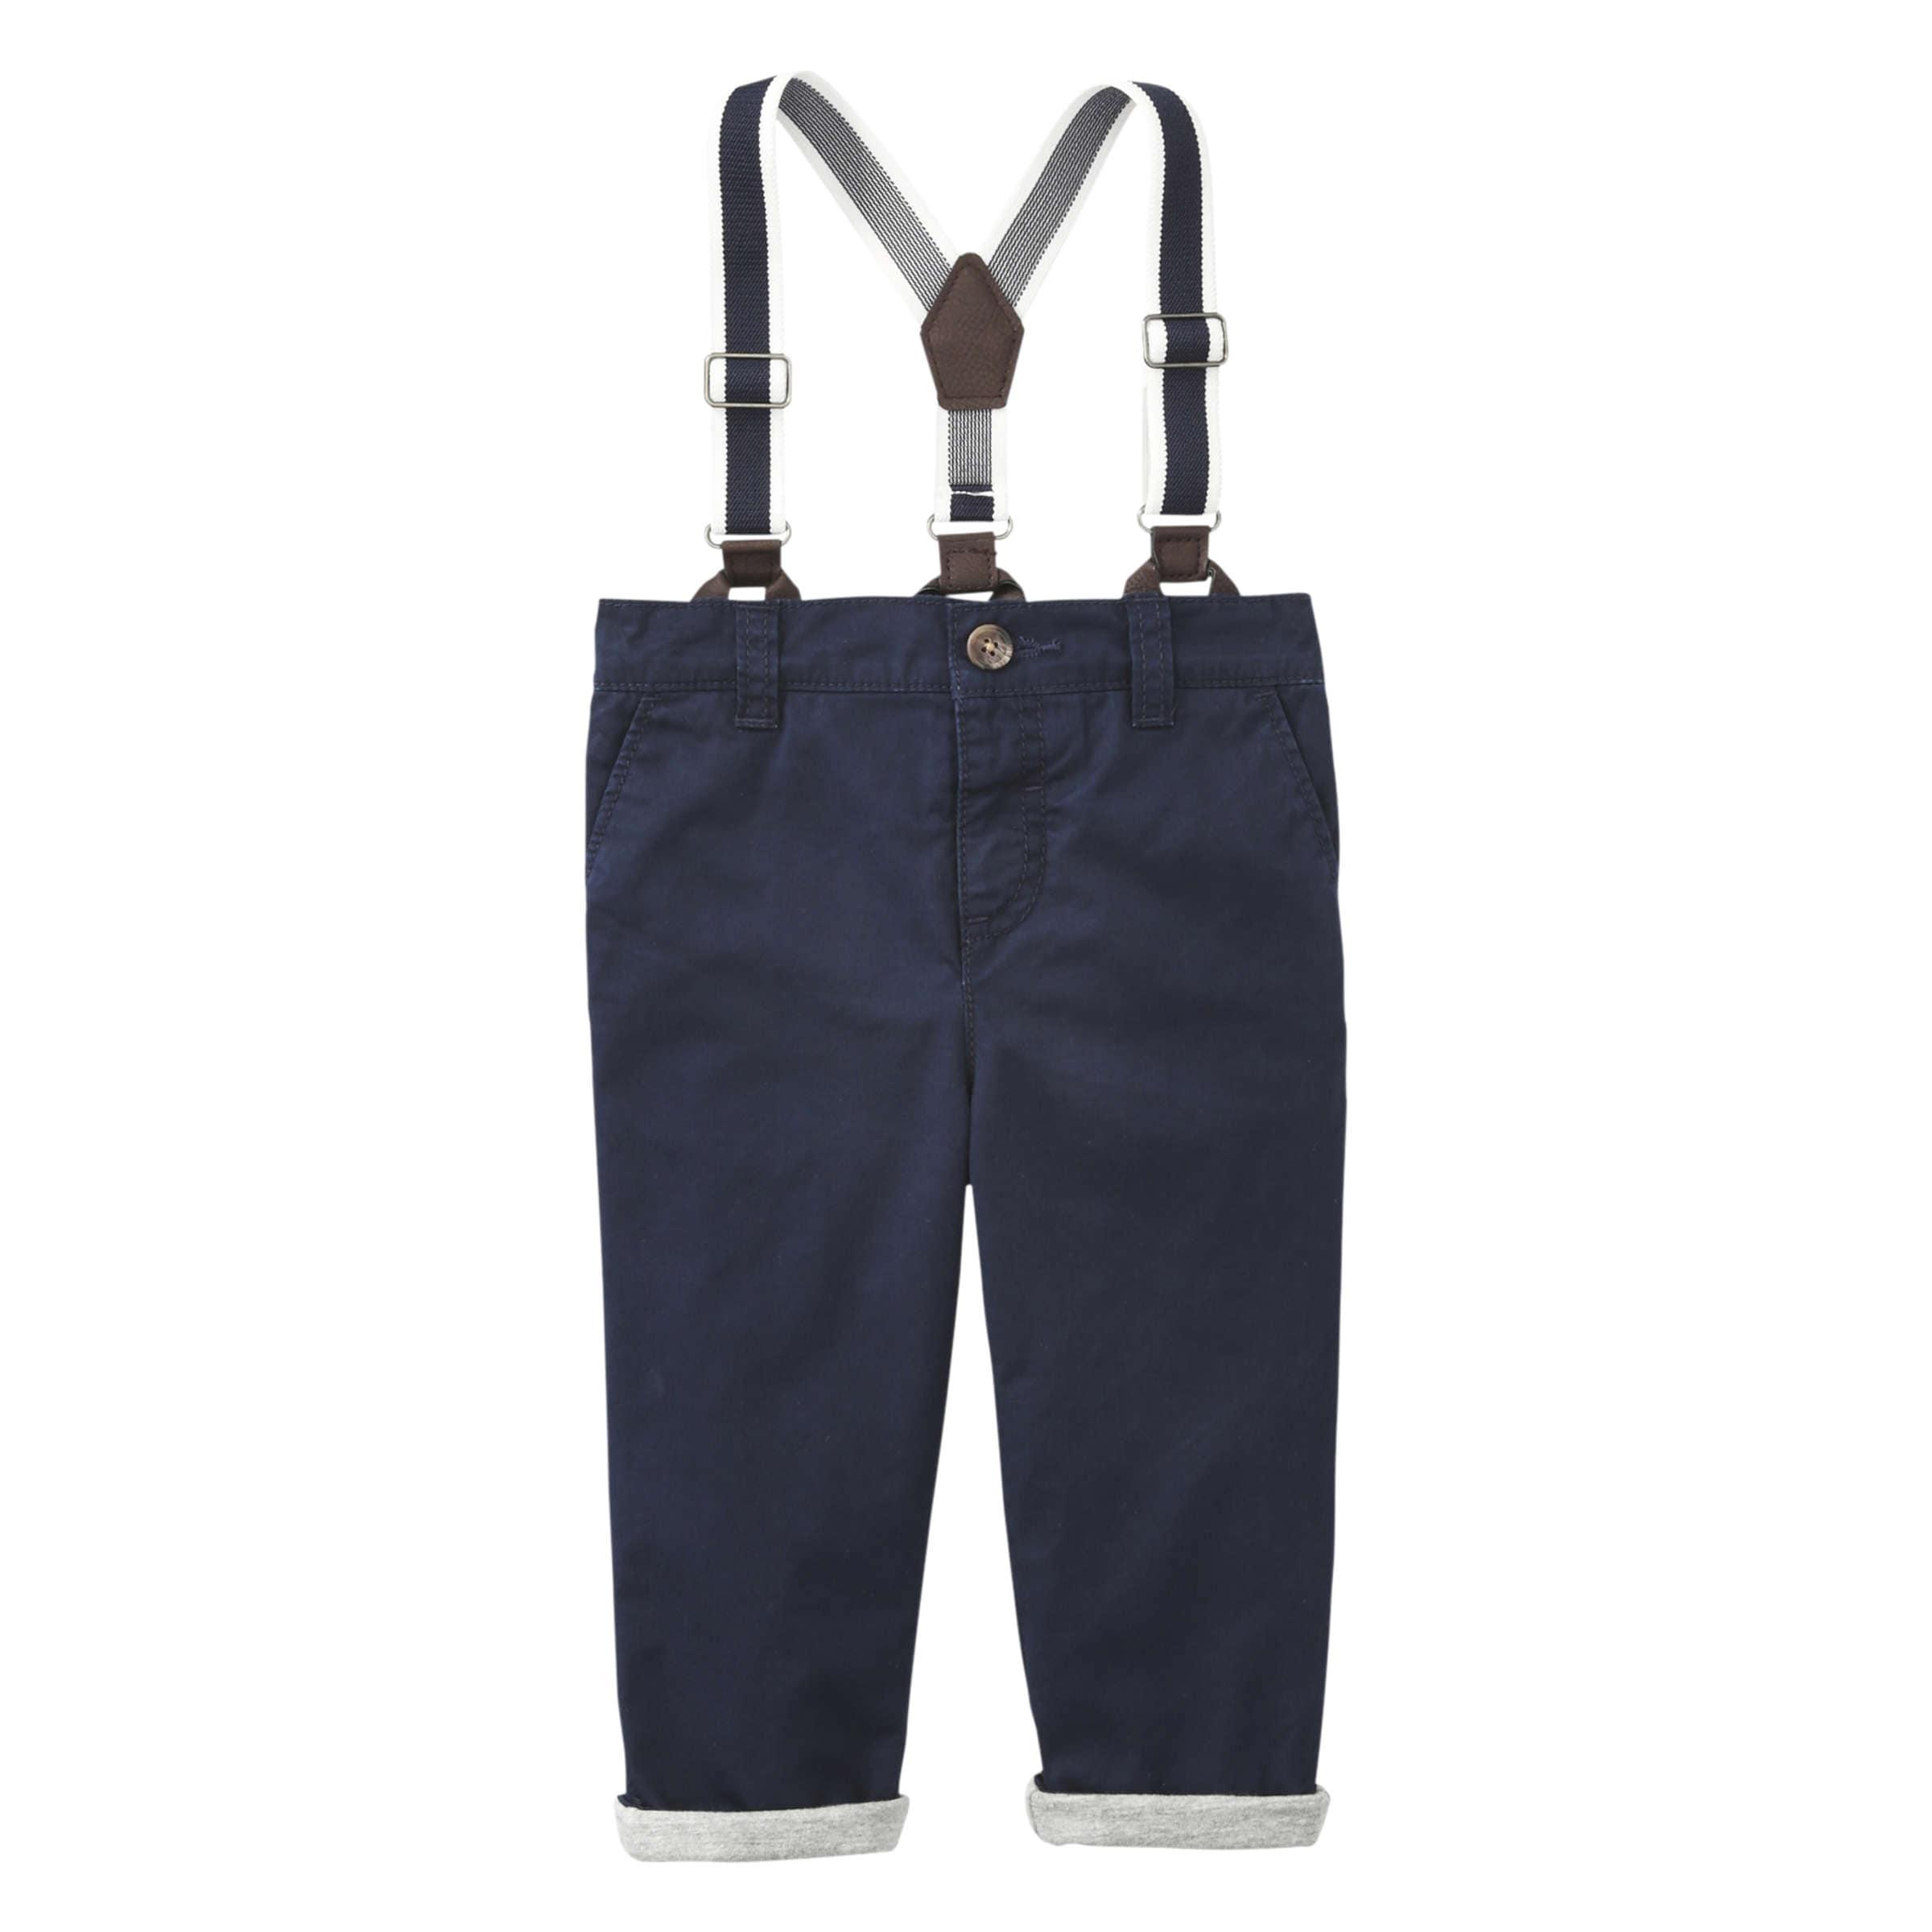 3333fe5513421 Joe Fresh Baby Boys' Suspender Pant